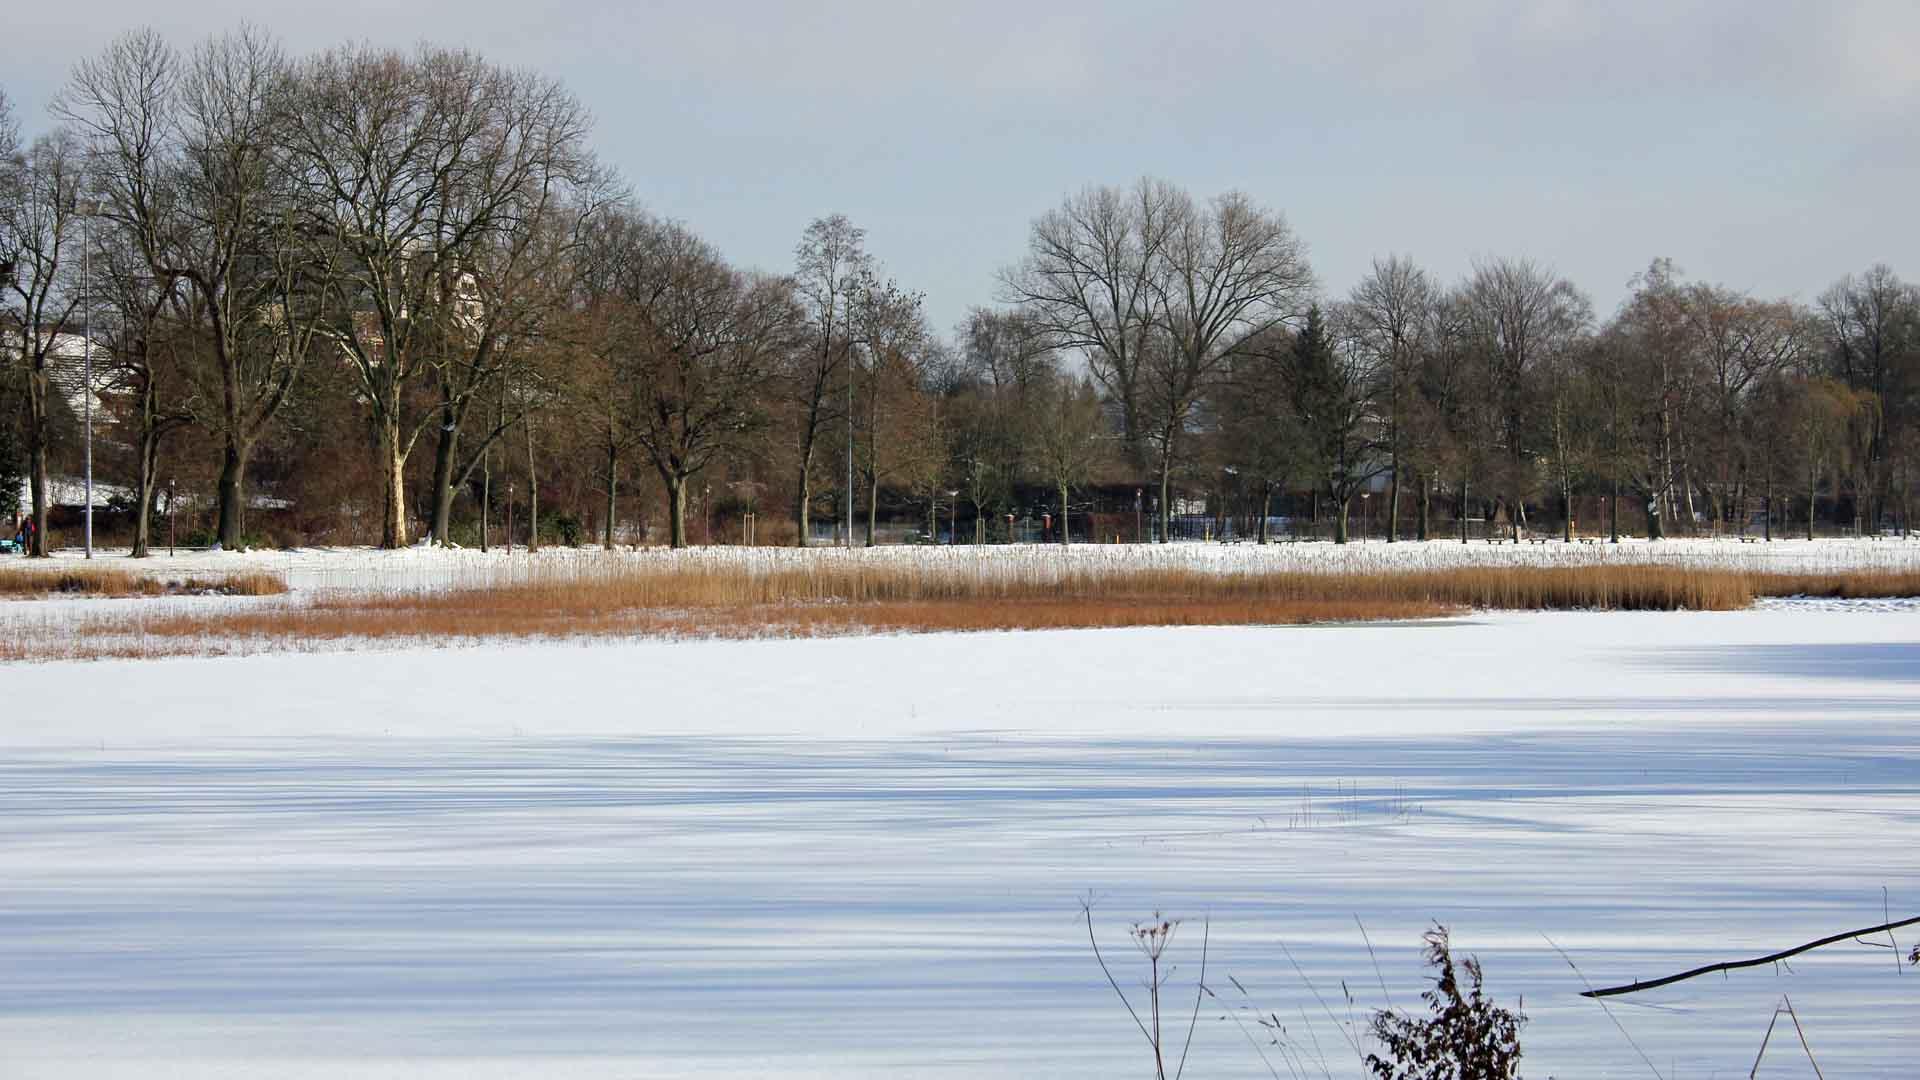 celle-dammaschwiese-winter-02